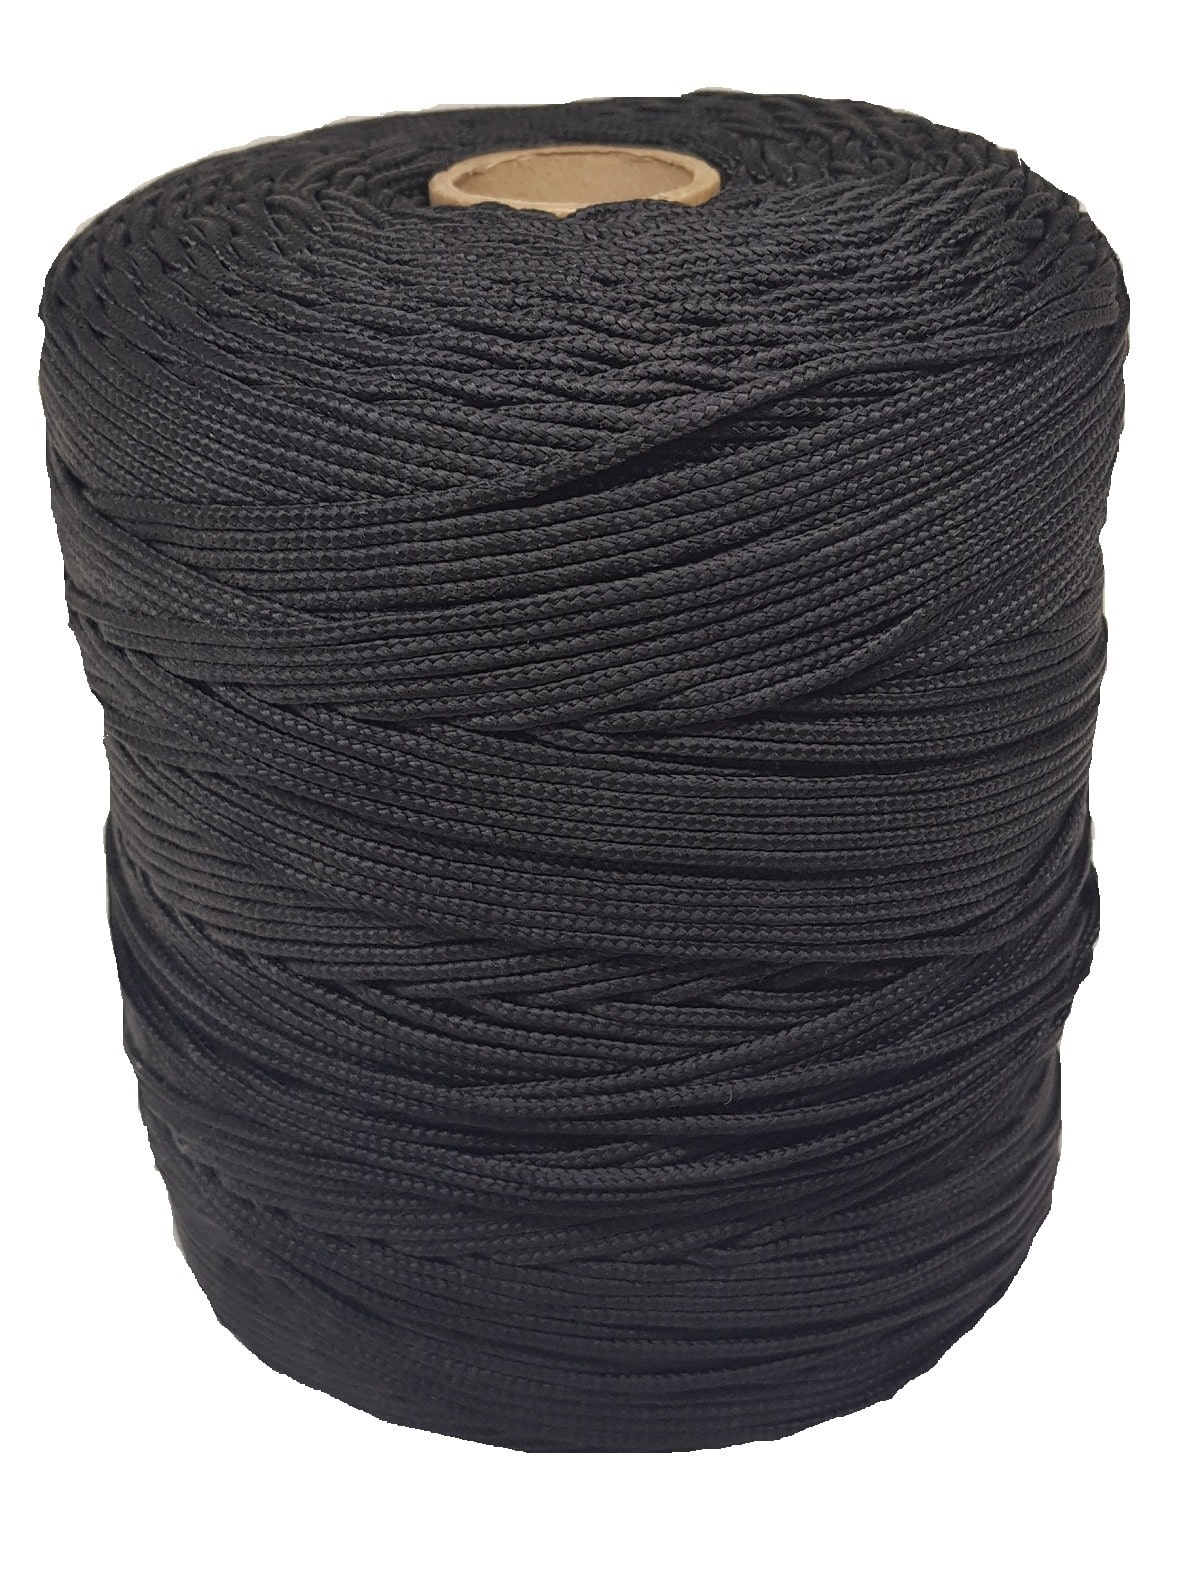 Corda Trançada de Polipropileno Preta 2.0 mm